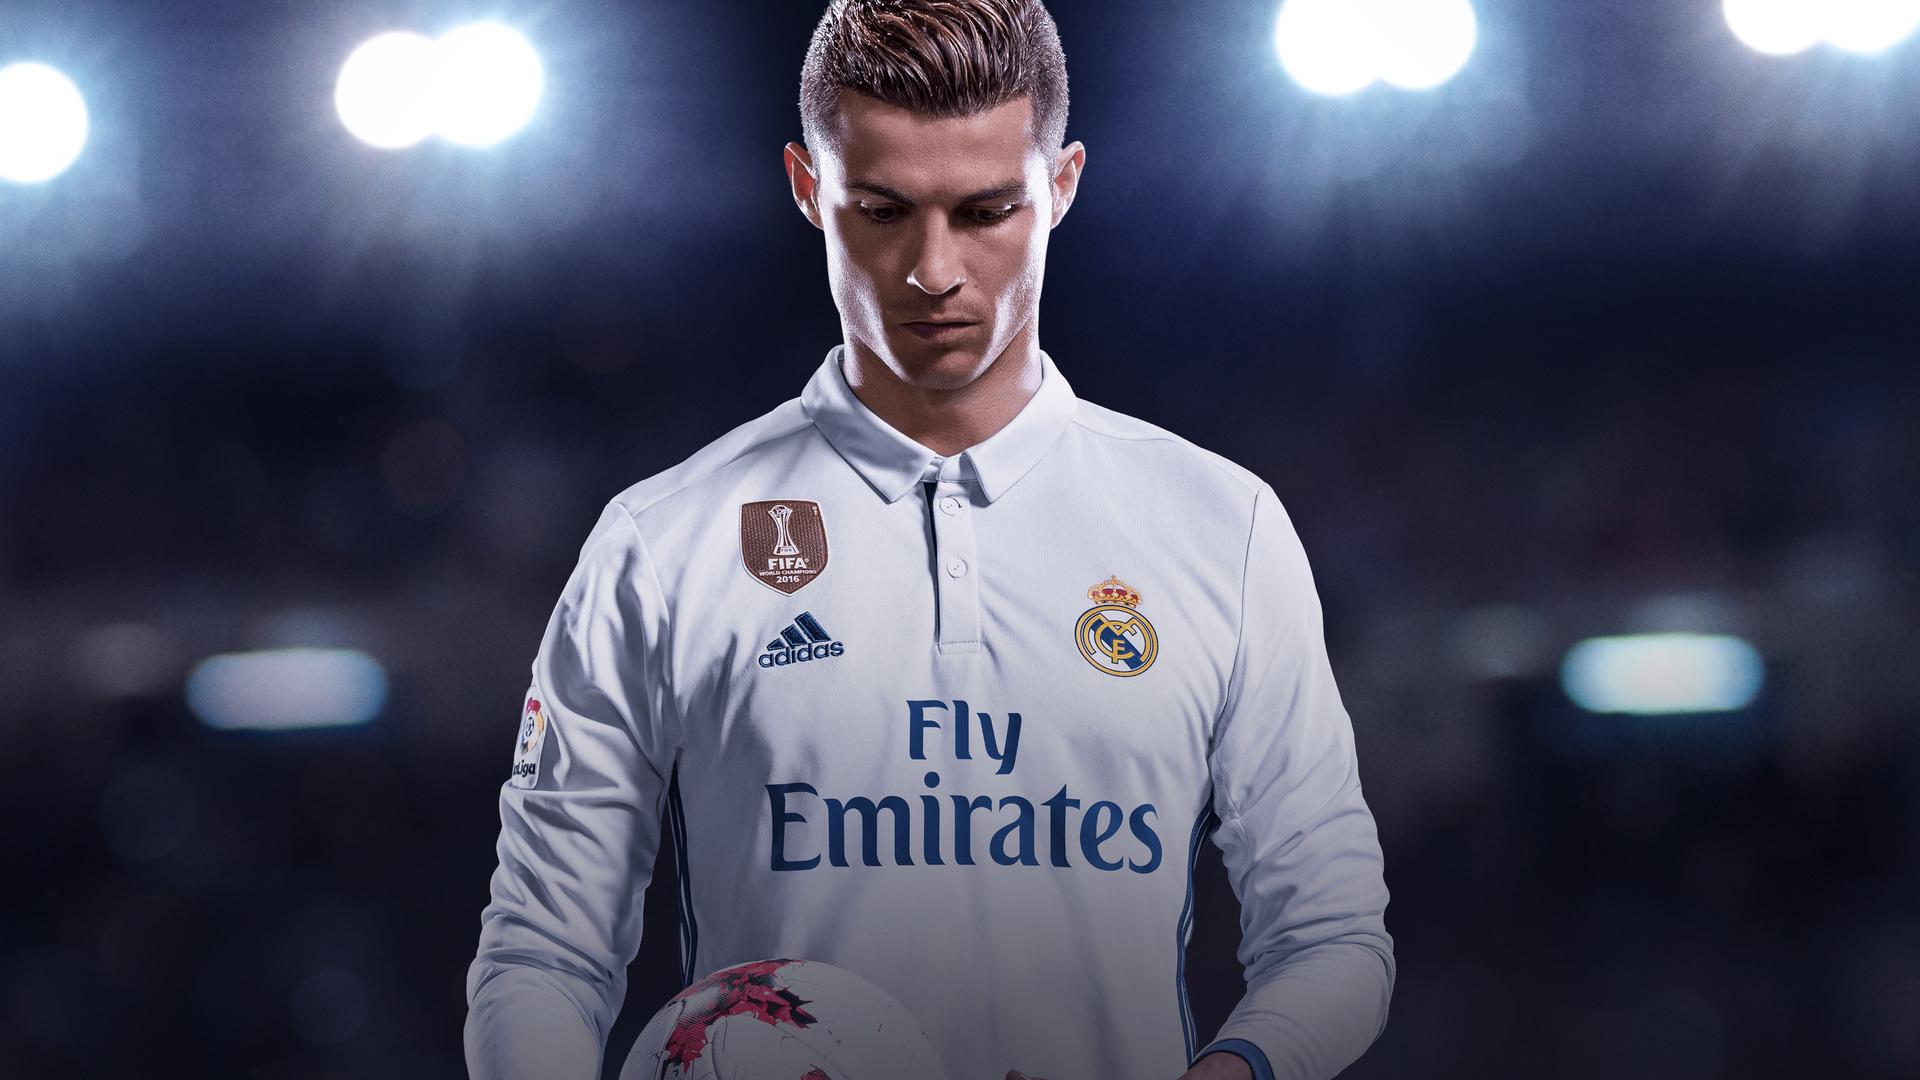 1920x1080 2017 Fifa 18 Cristiano Ronaldo Laptop Full HD